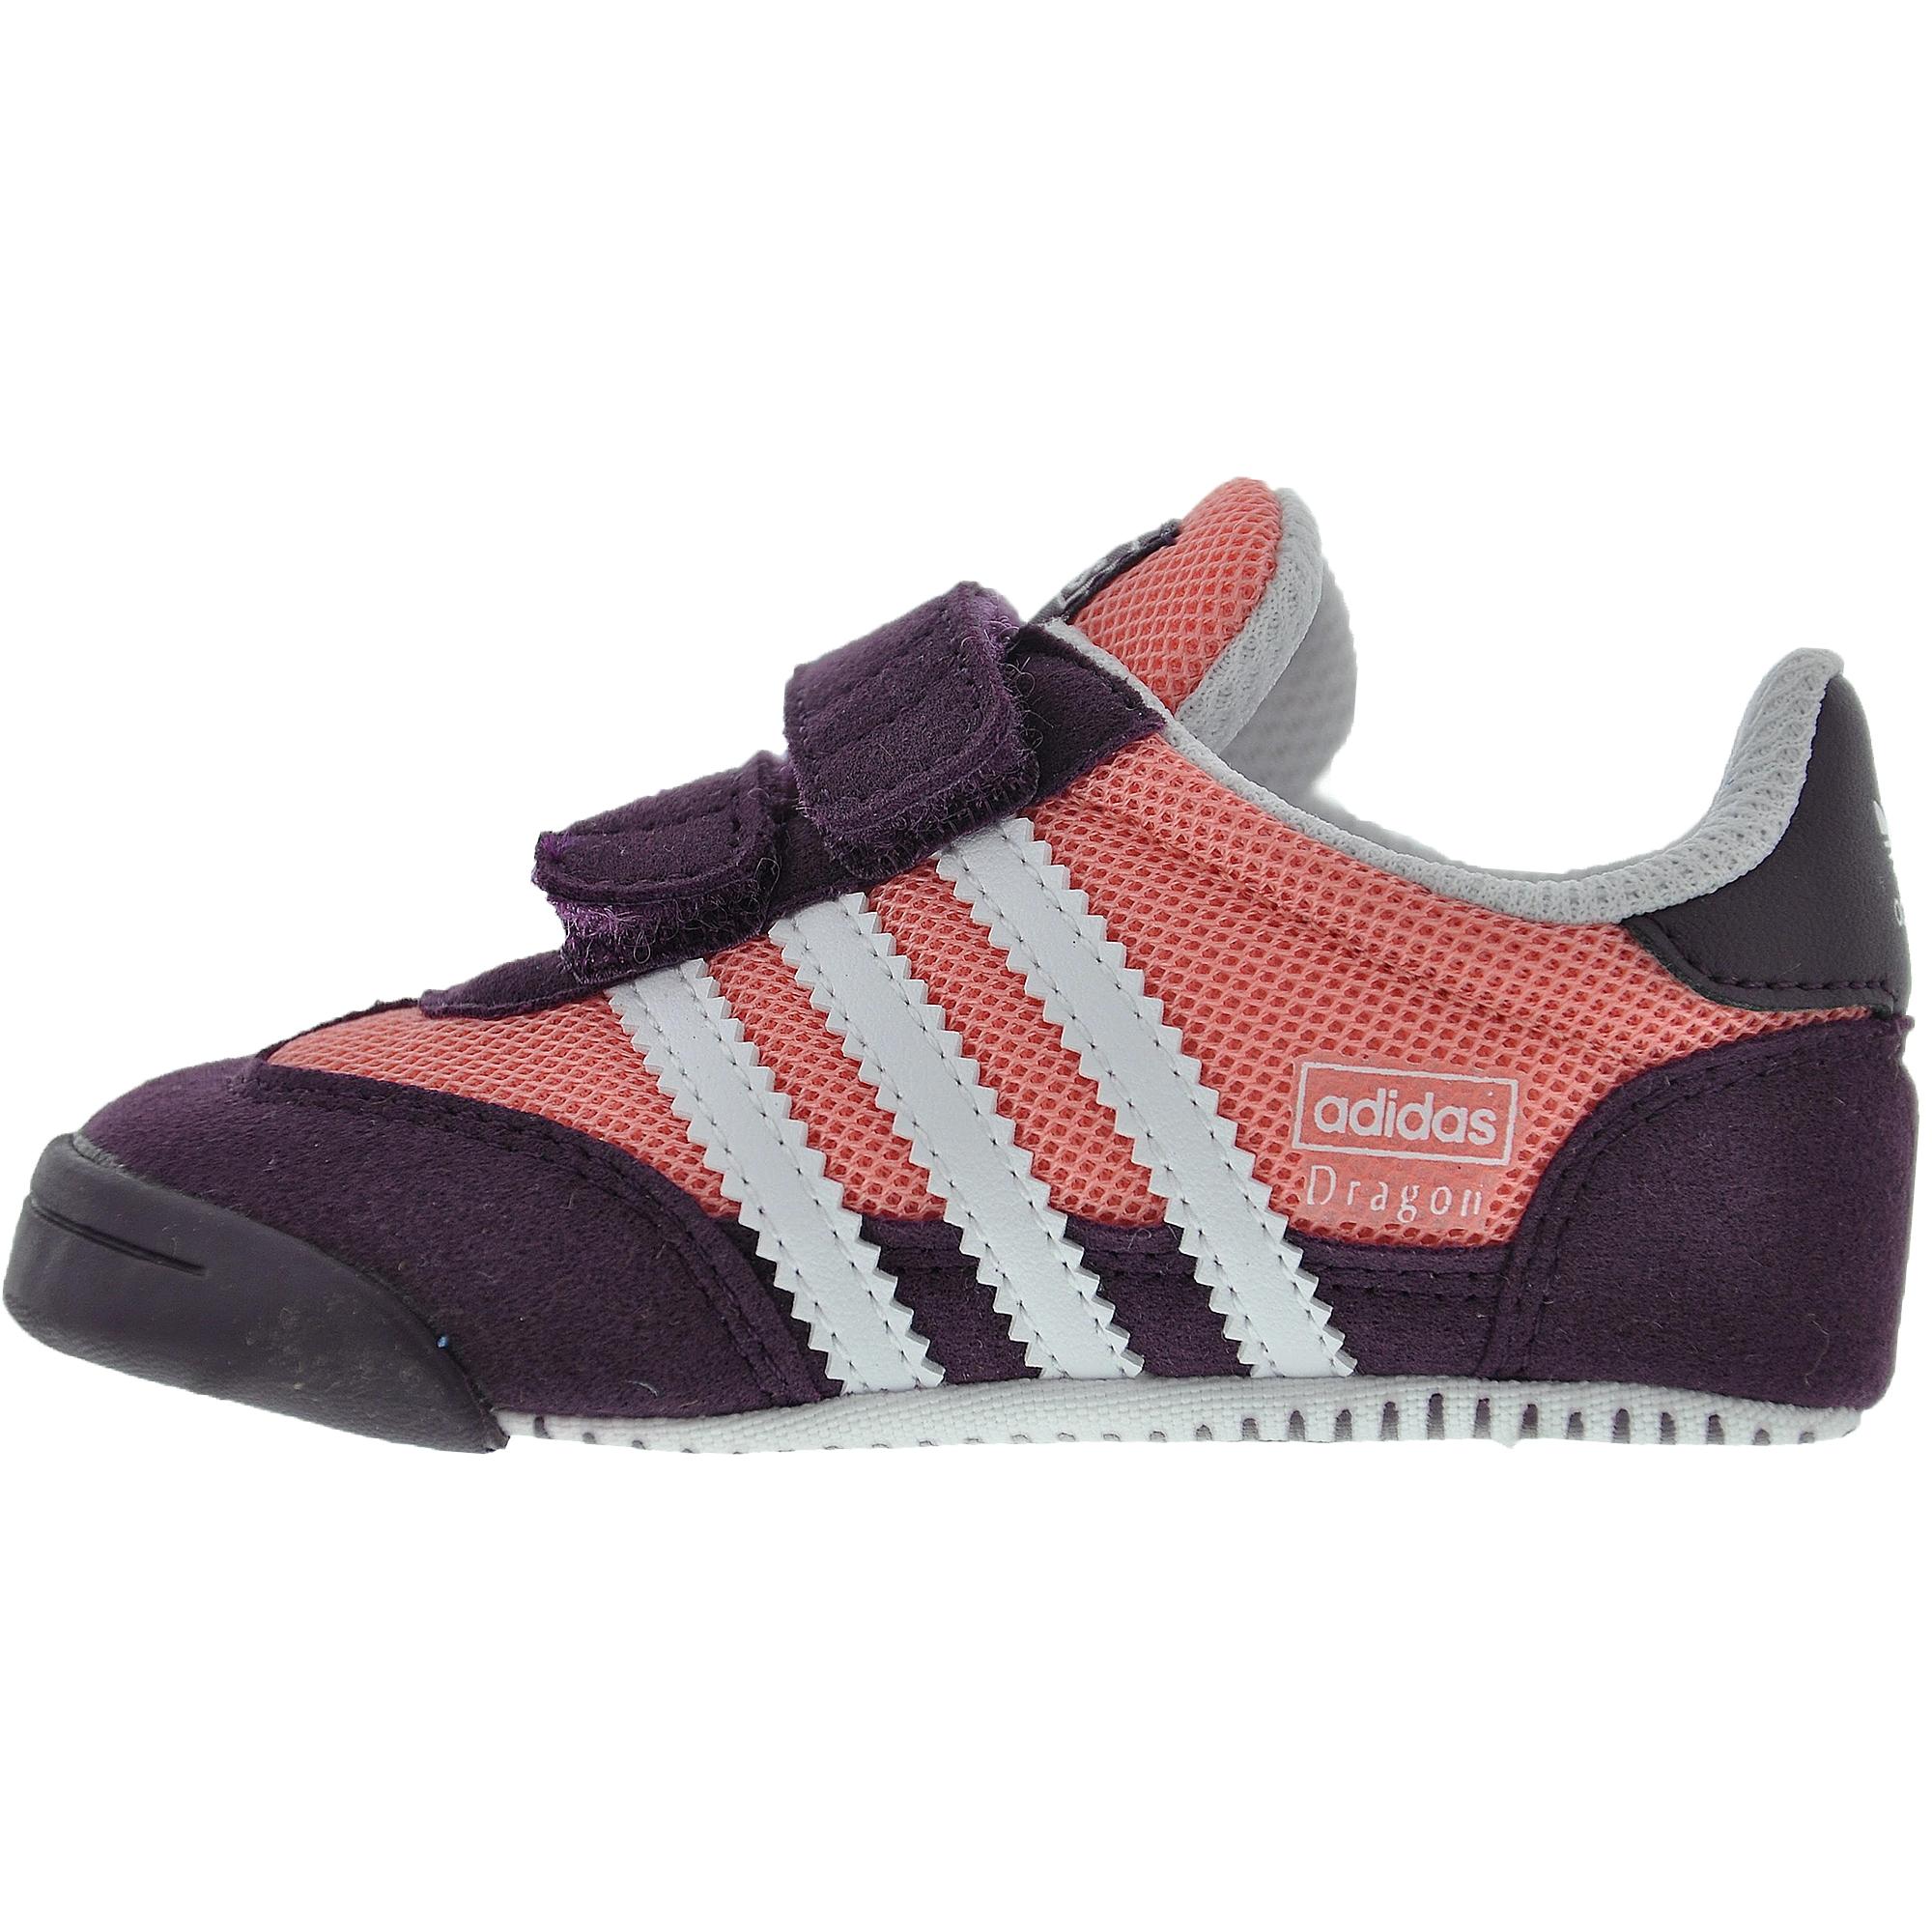 sports shoes 6c38a 699be adidas dragon bebek